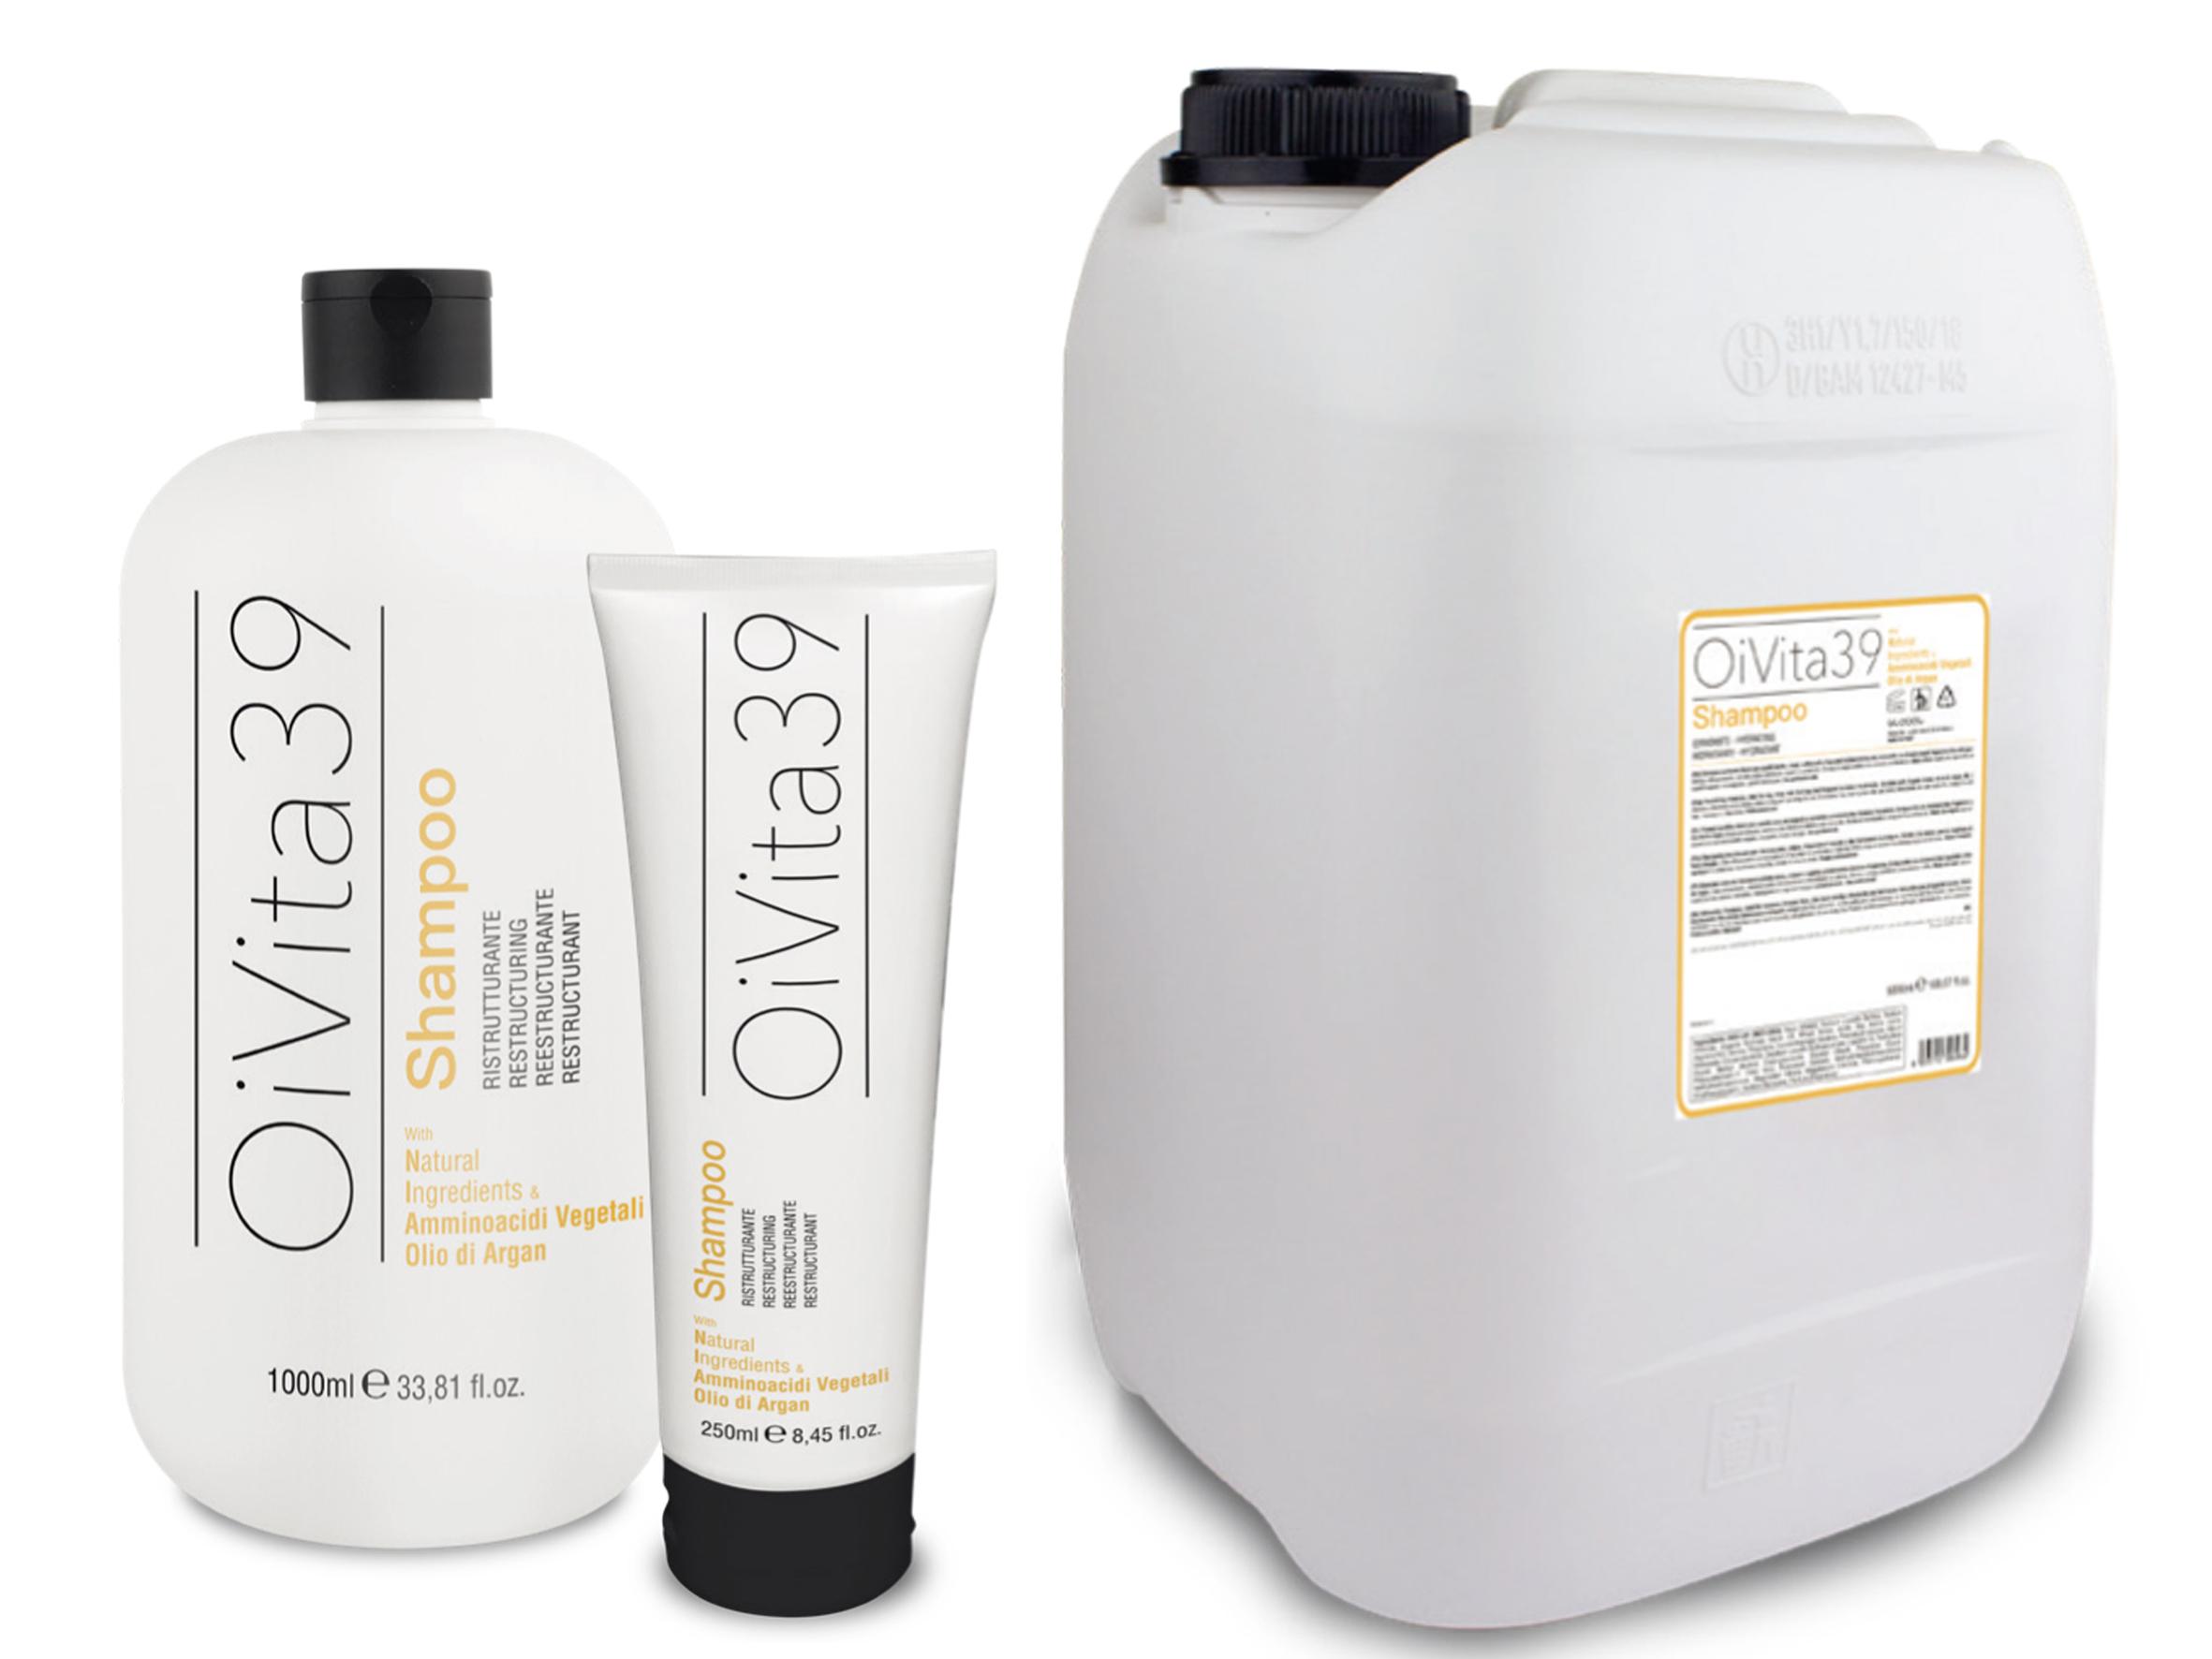 OiVita39 New Nourishing shampoo - hydratační šampon